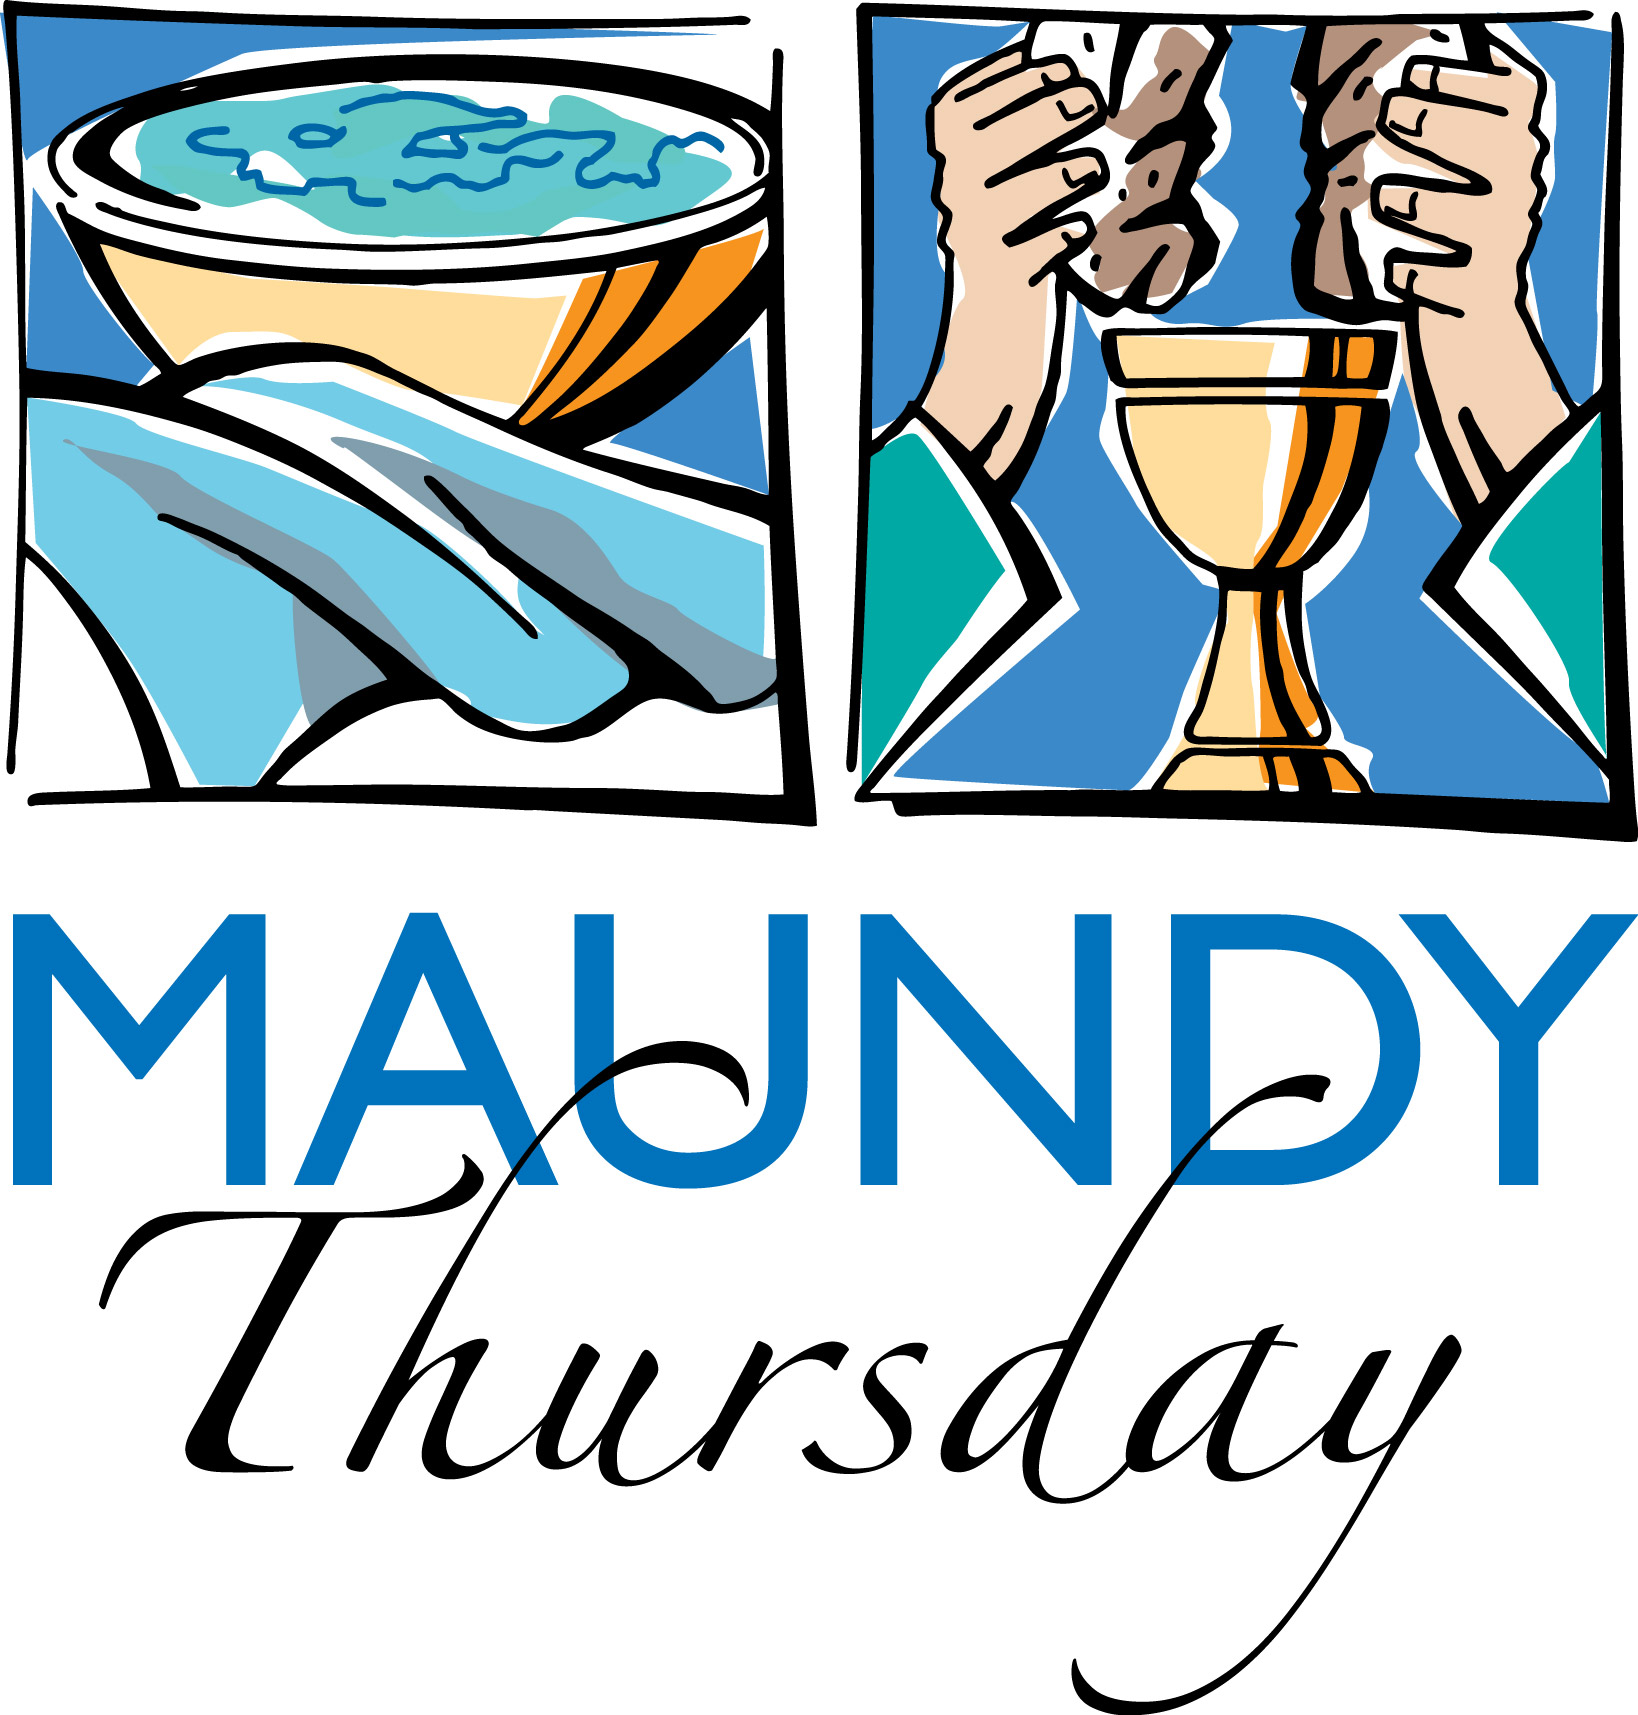 Maundy Thursday Clipart Free.